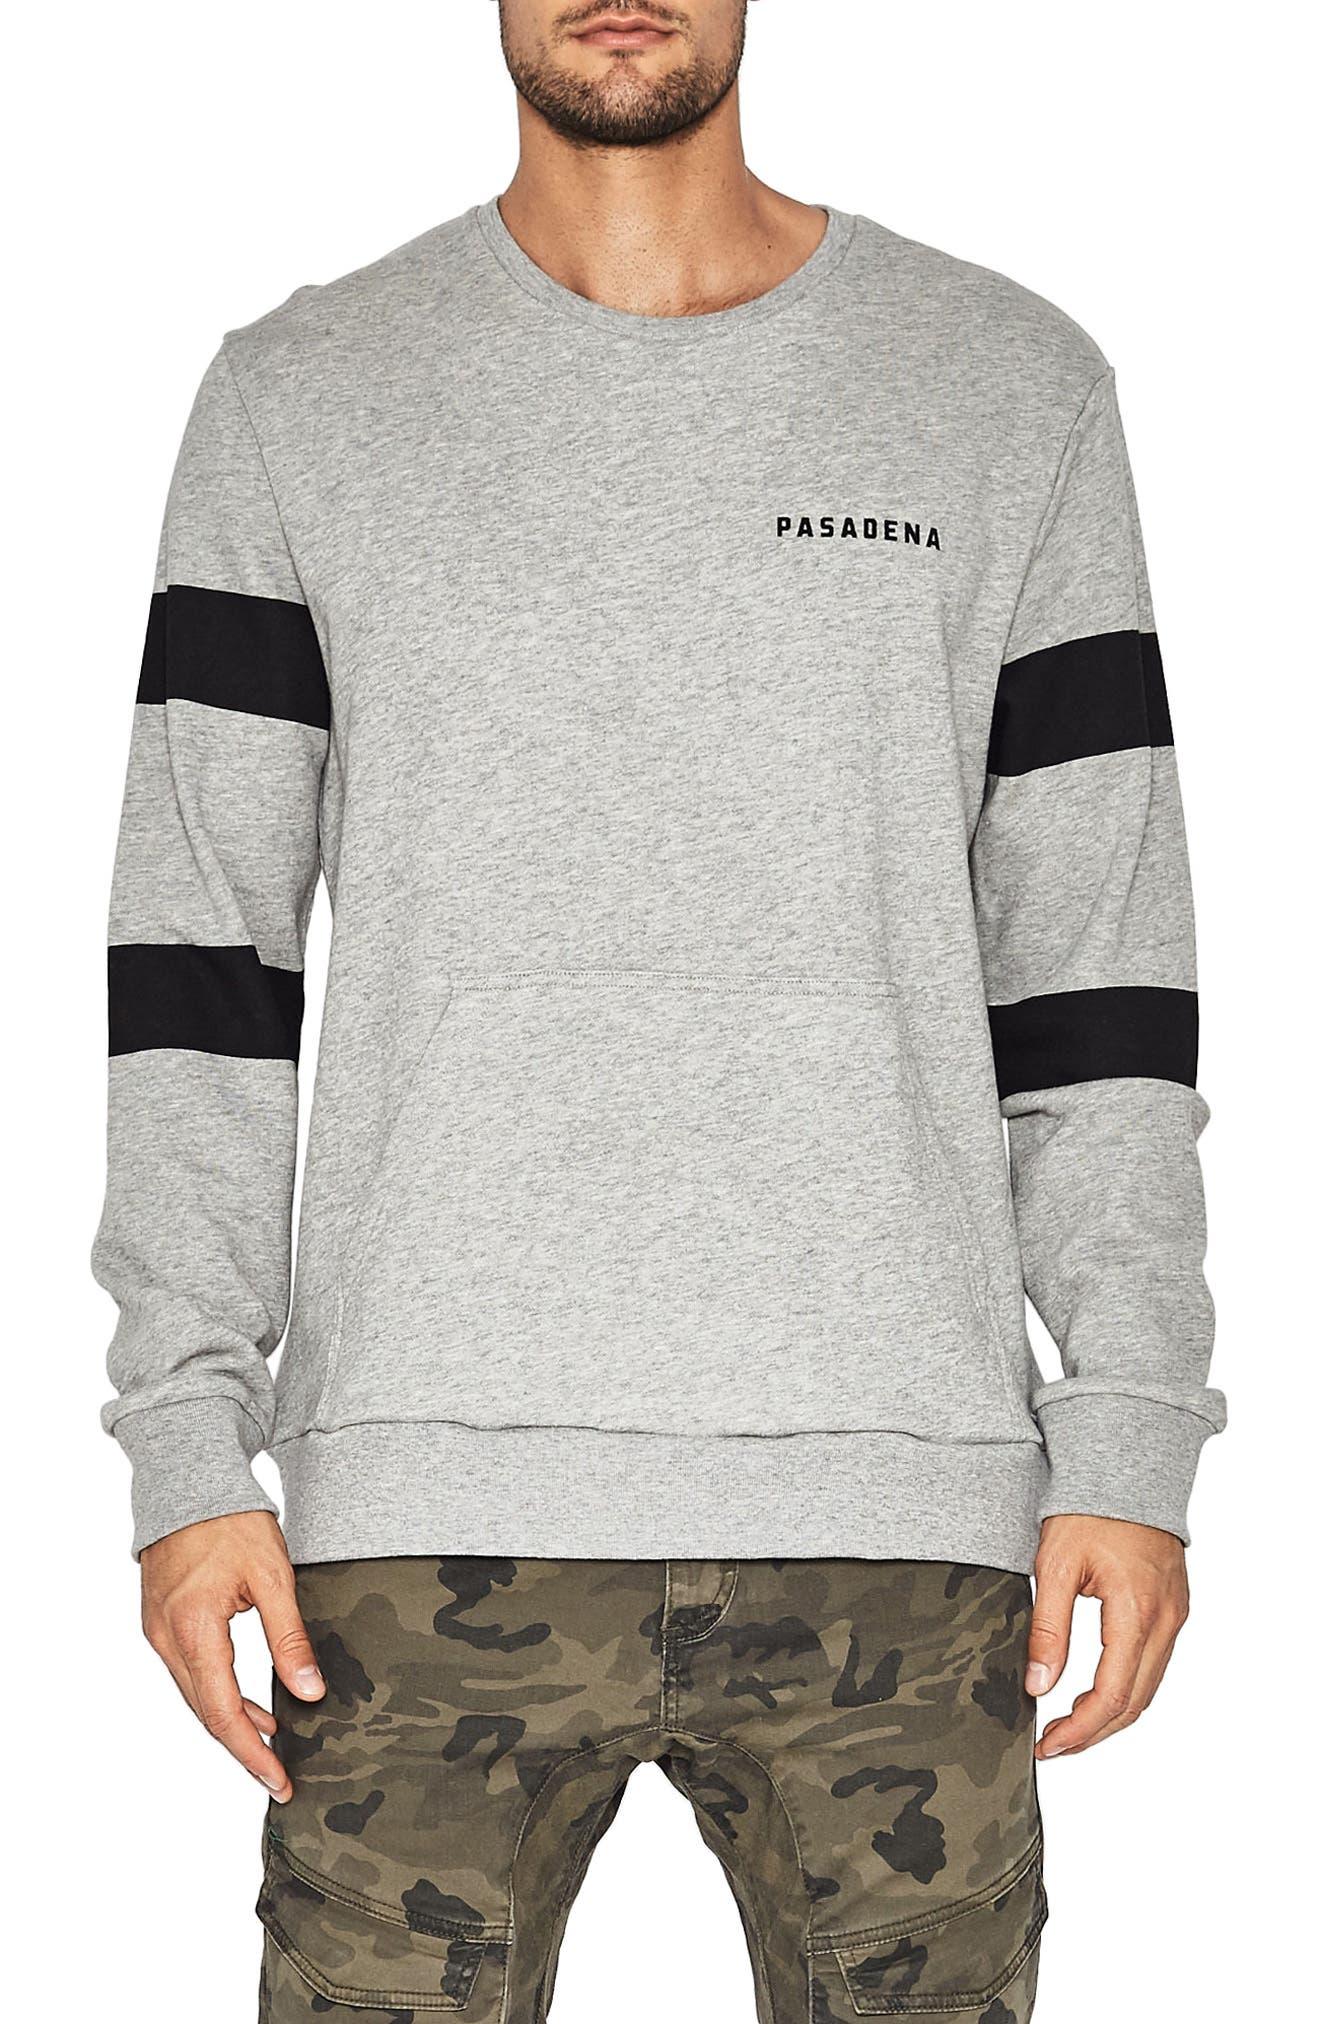 Turbo Hawk Sweatshirt,                         Main,                         color, 062